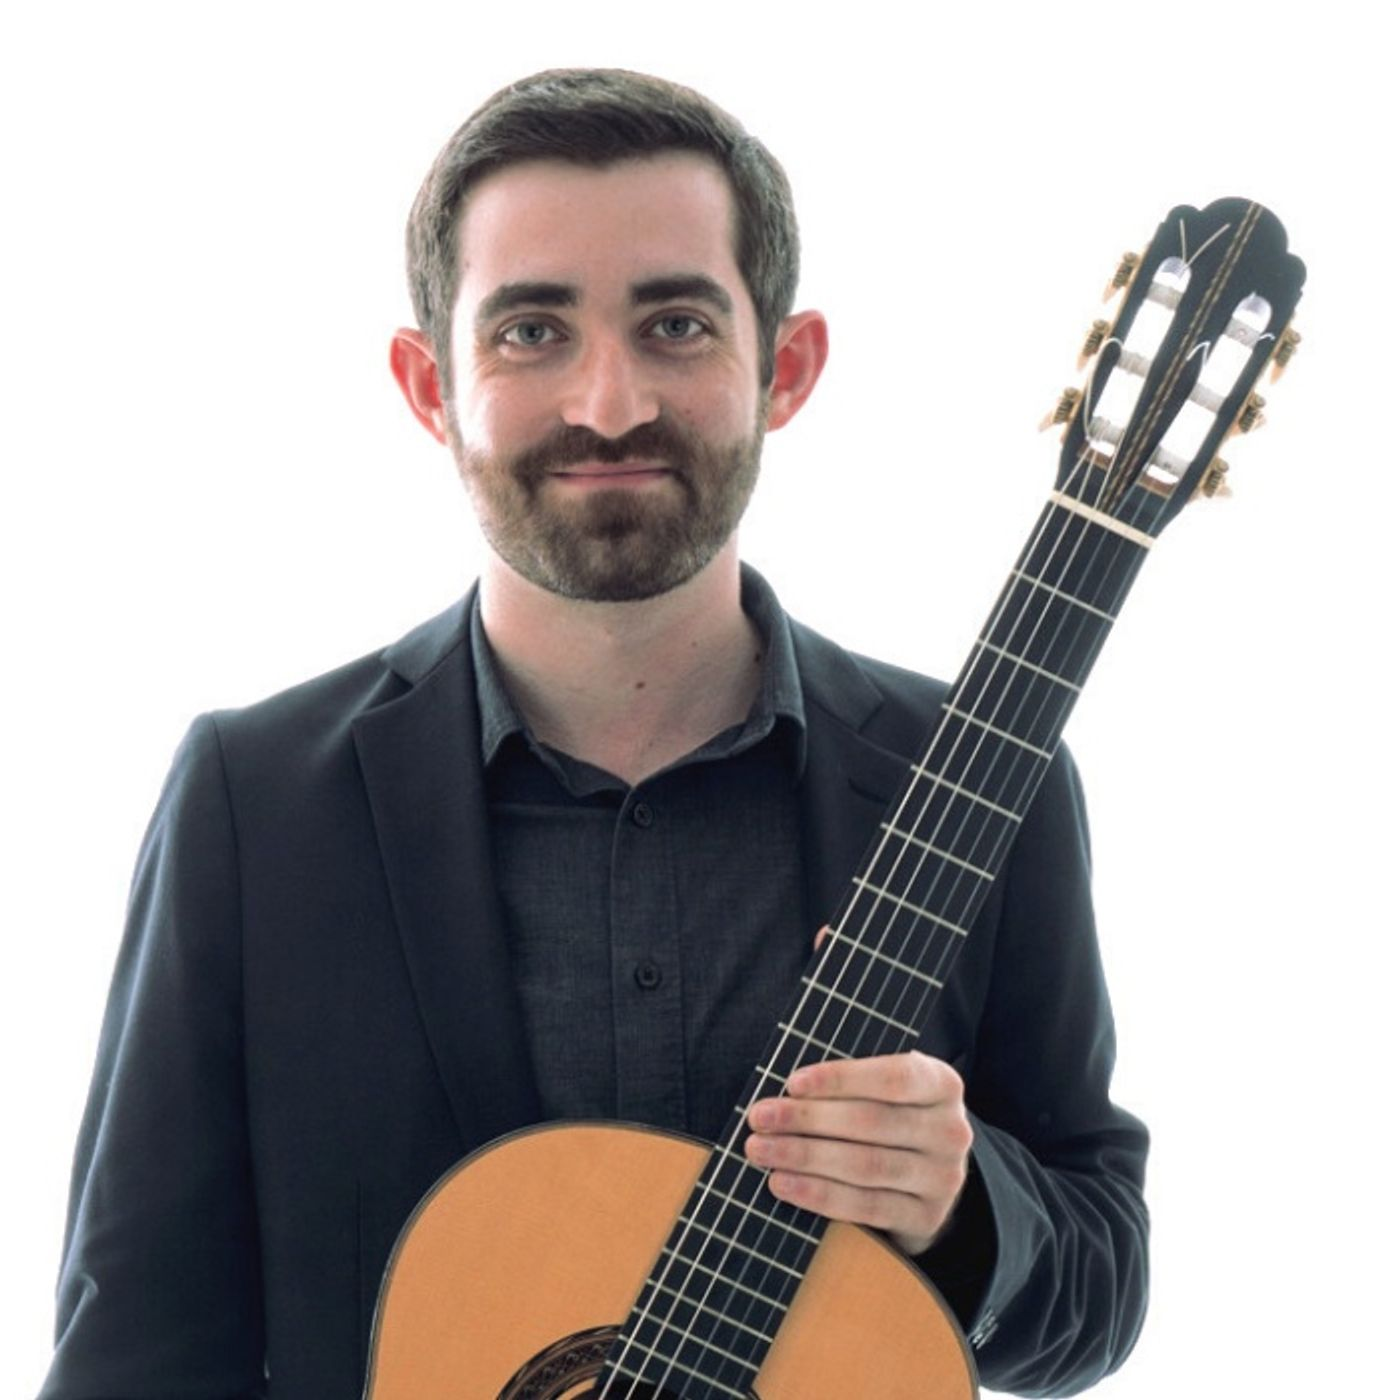 Daniel Volovets